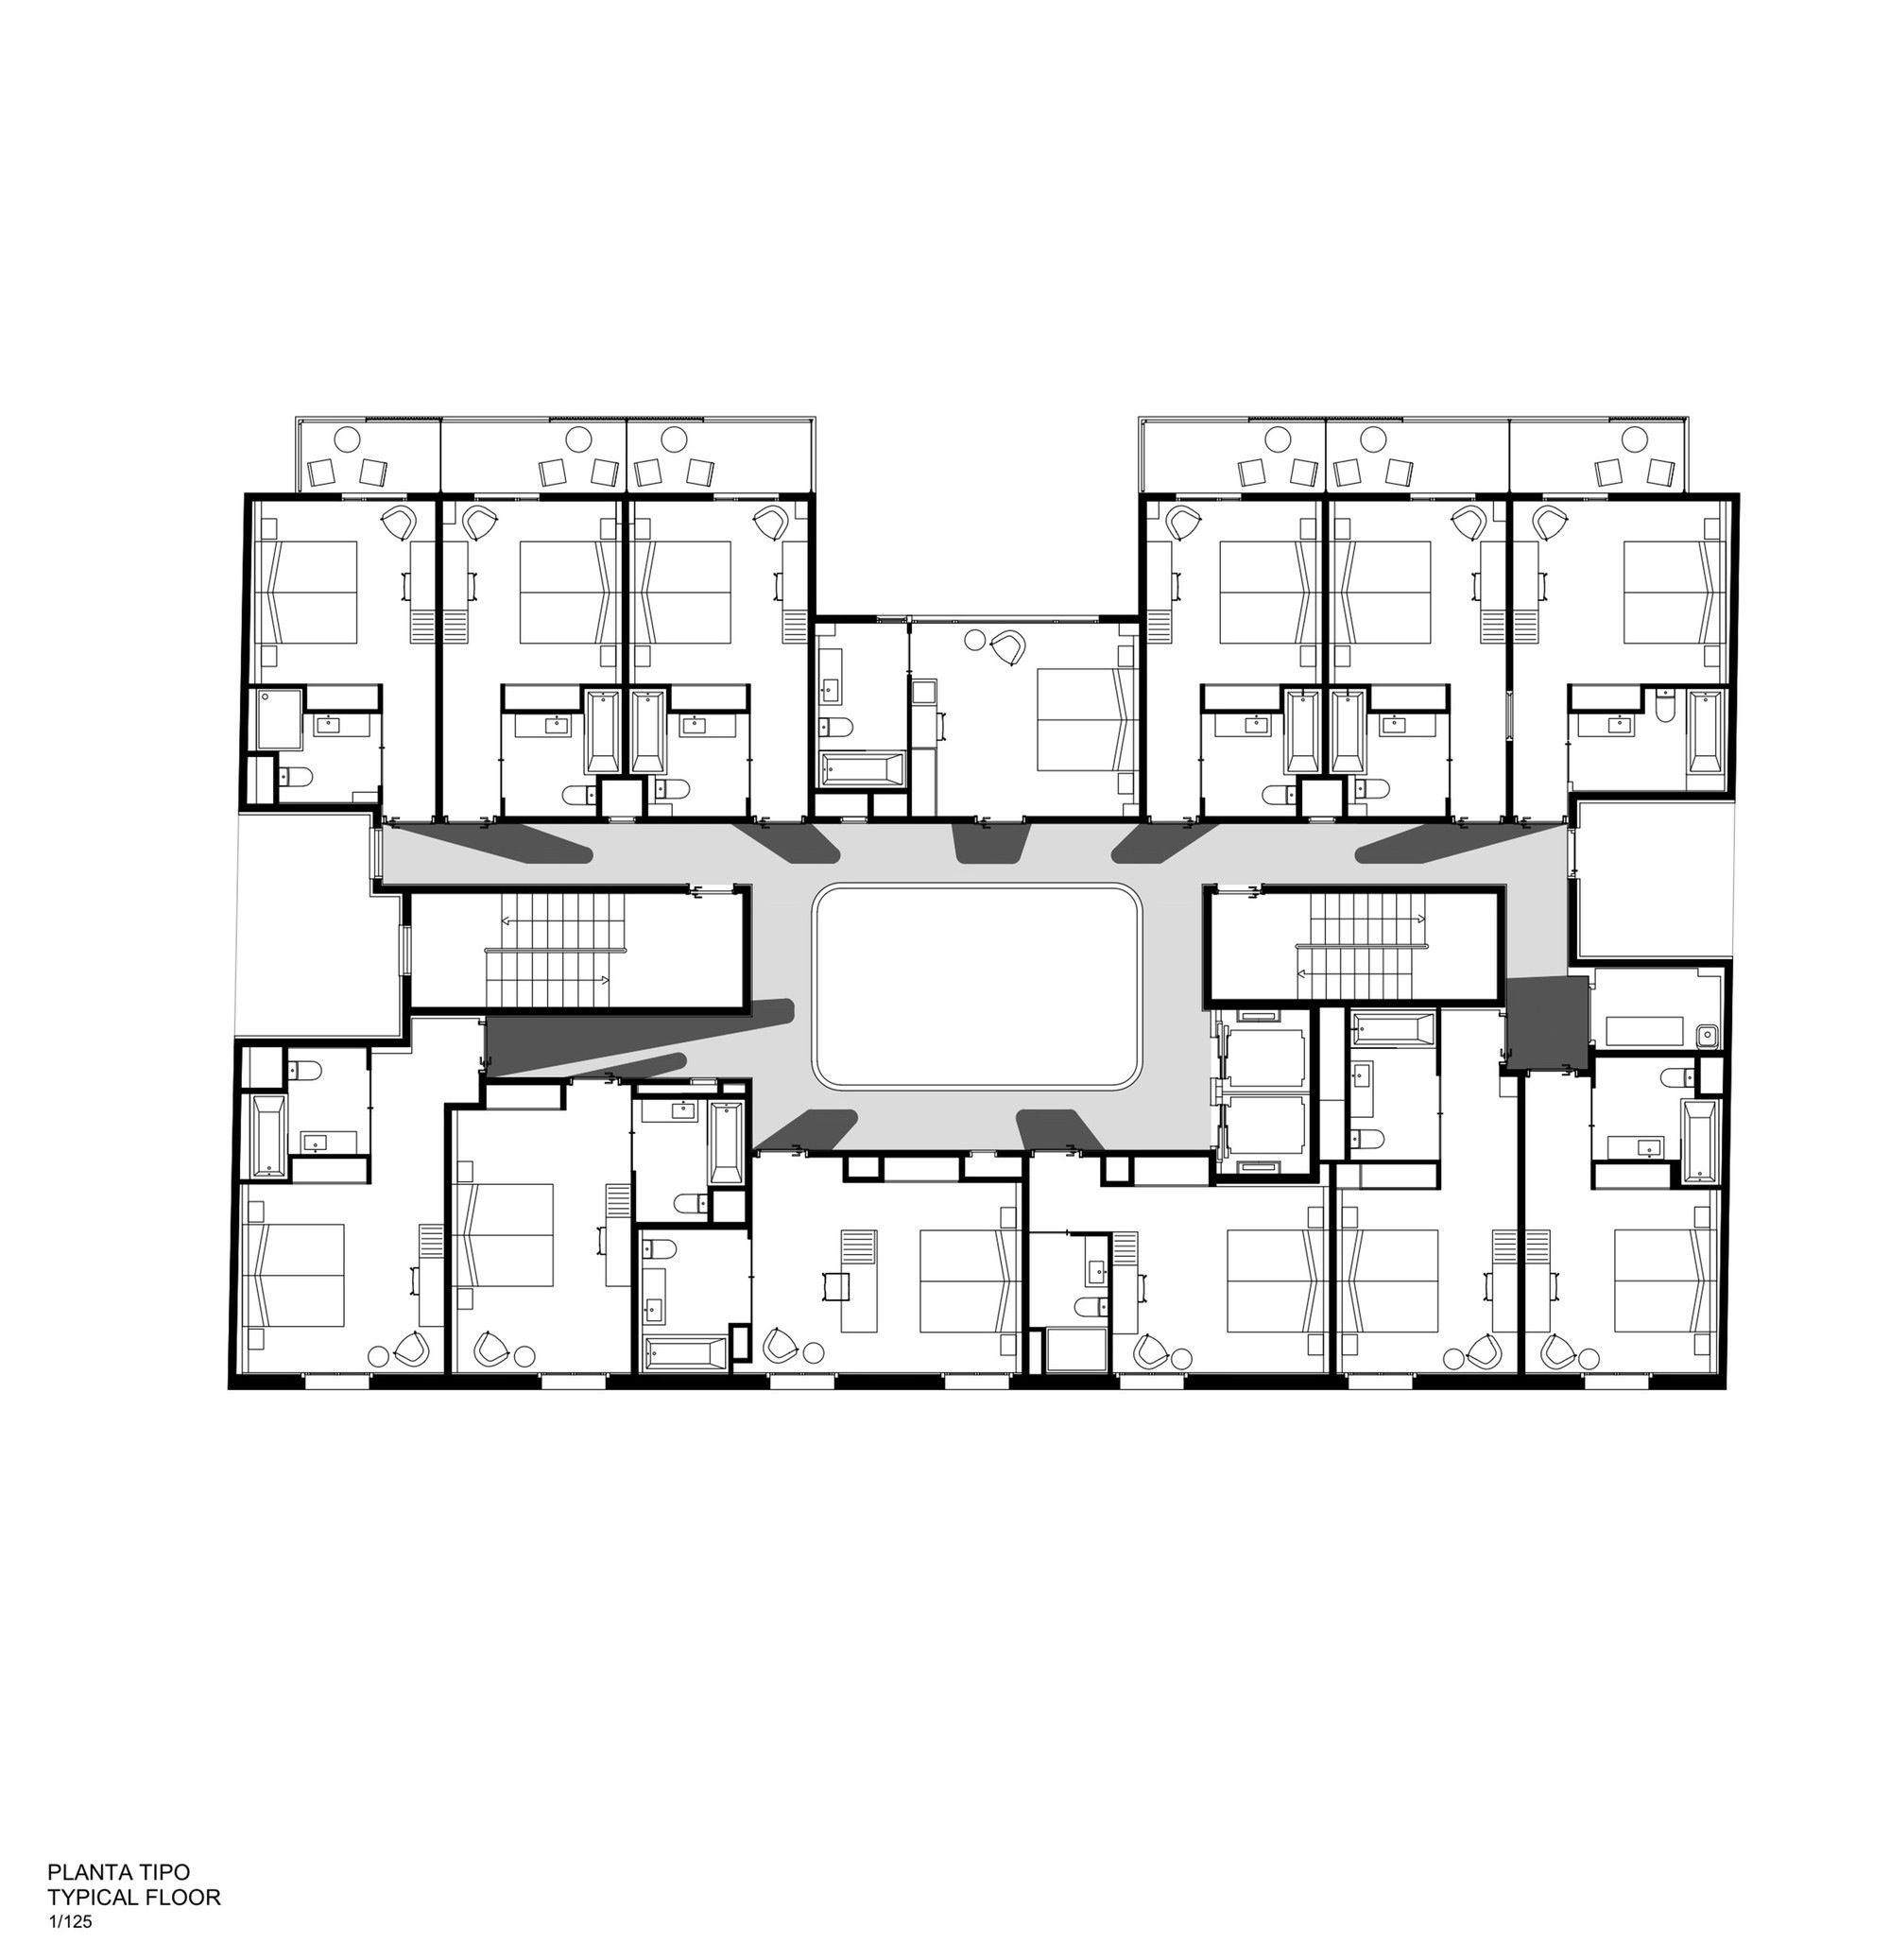 Hotel Vincci Gala Barcelona Tbi Architecture Engineering Floor Plan. Design  Hotel New York. Hotel